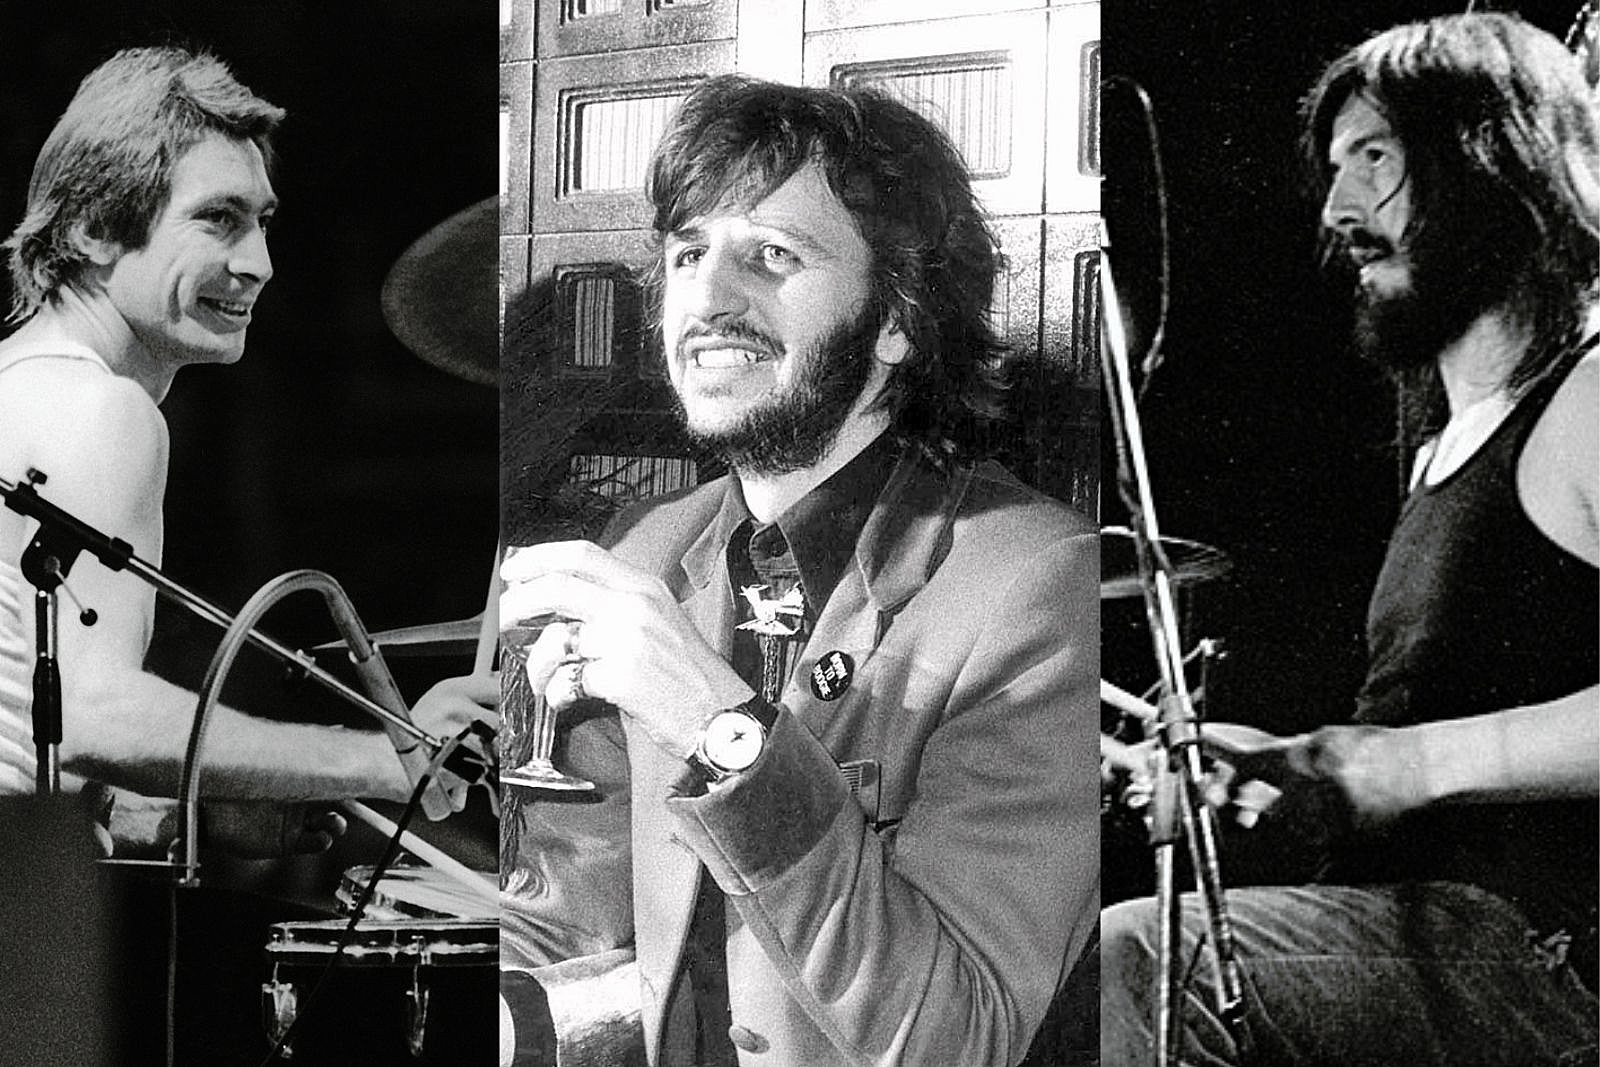 That Time Charlie Watts, Ringo Starr and John Bonham Hung Out